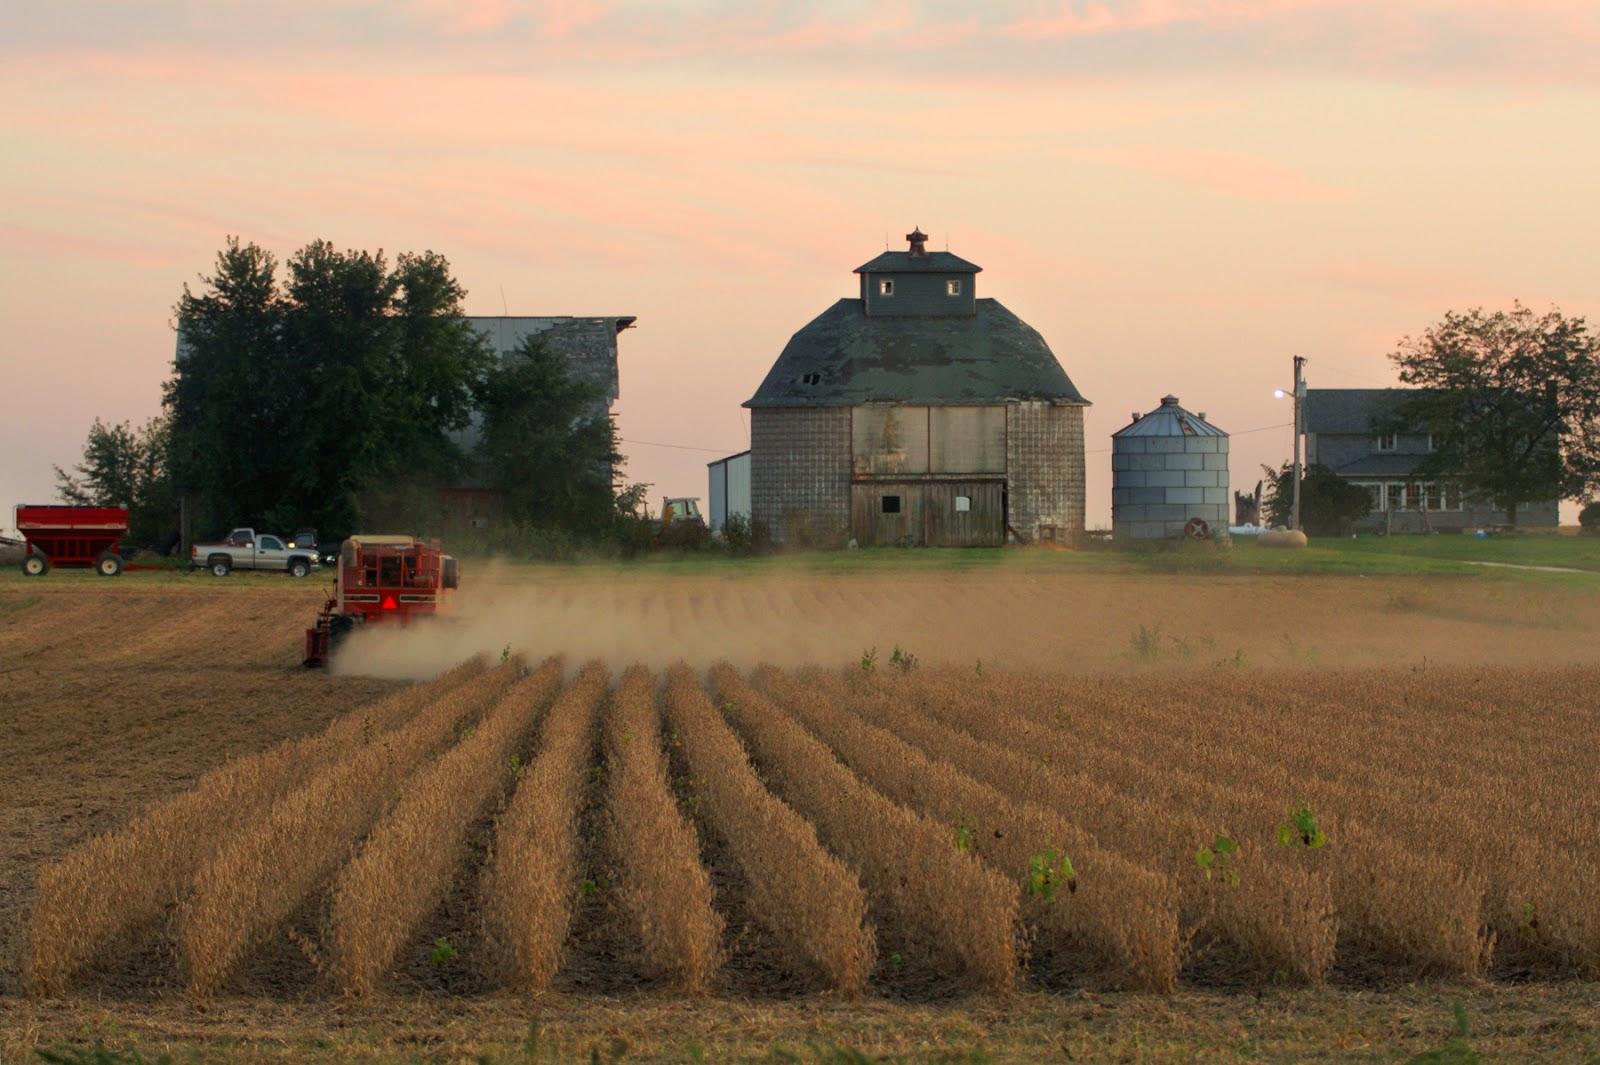 http://www.npr.org/blogs/thesalt/2015/03/18/393841311/pain-from-the-grain-corn-belt-towns-languish-as-prices-drop